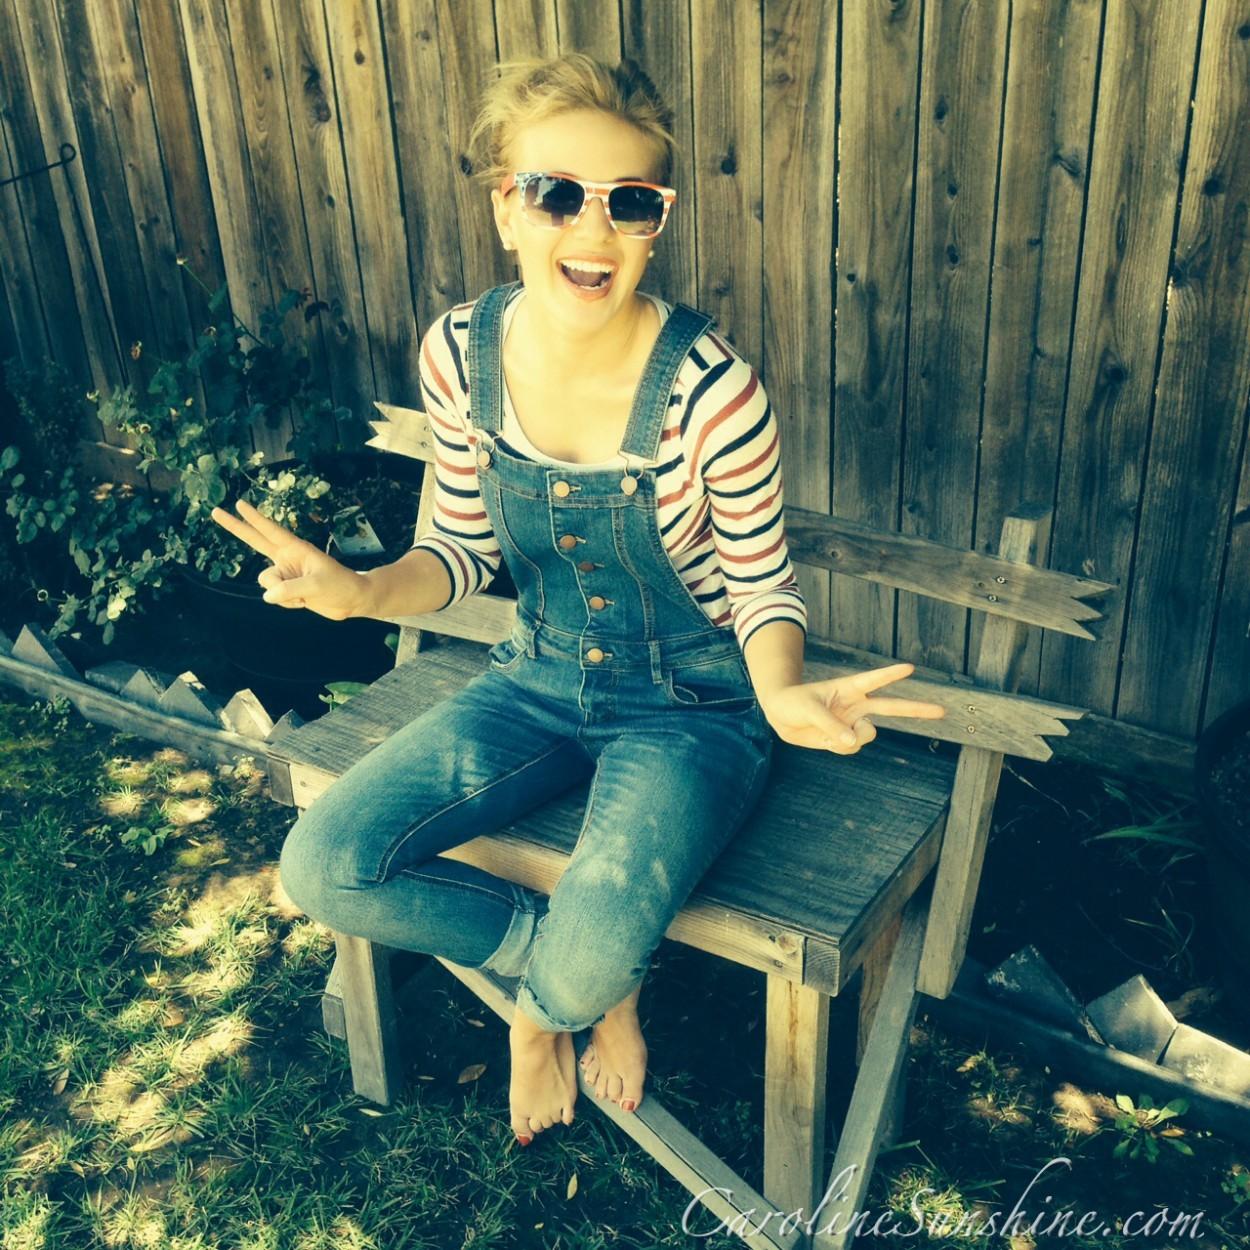 Caroline sunshine feet